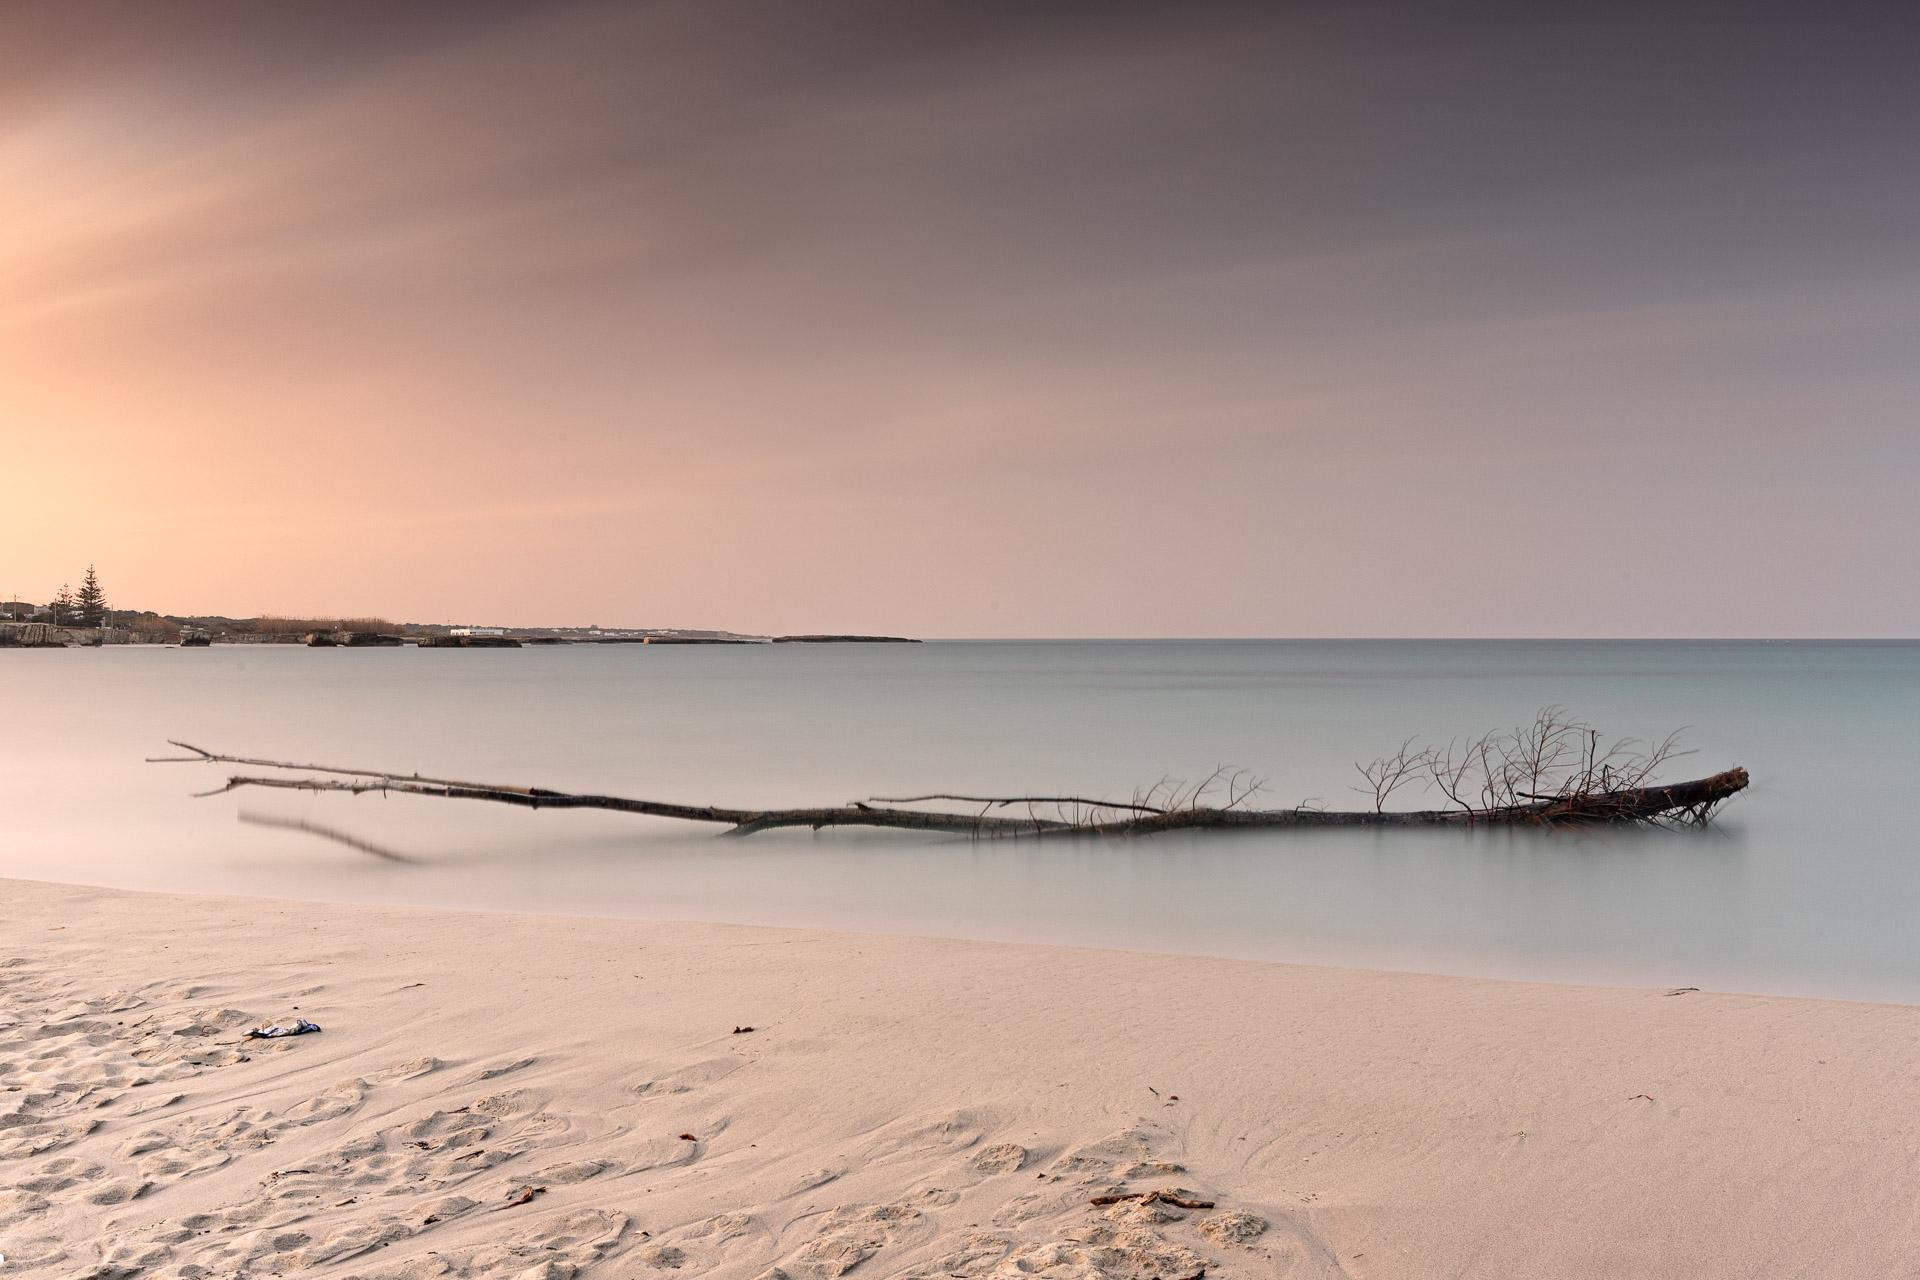 Tramonto a San Foca con un tronco in mare, seascape long exposure photography